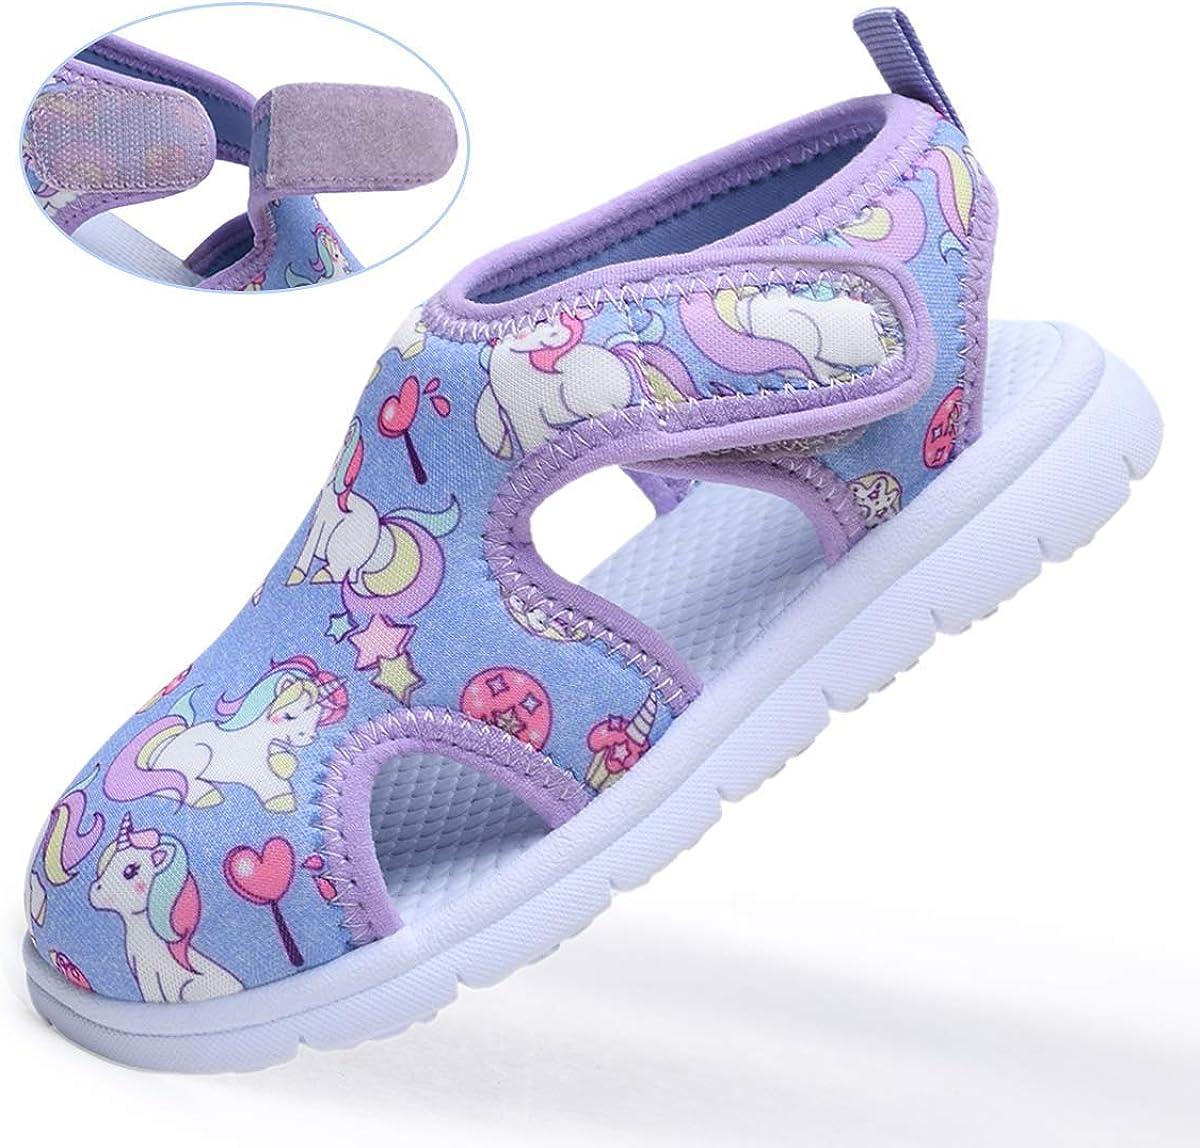 Vogana Toddler Beach Sandals - Prevent Cuts Waterproof Non-Slip - Summer Swim Water Shoes for Kids Boys Girls(2-6 Years)